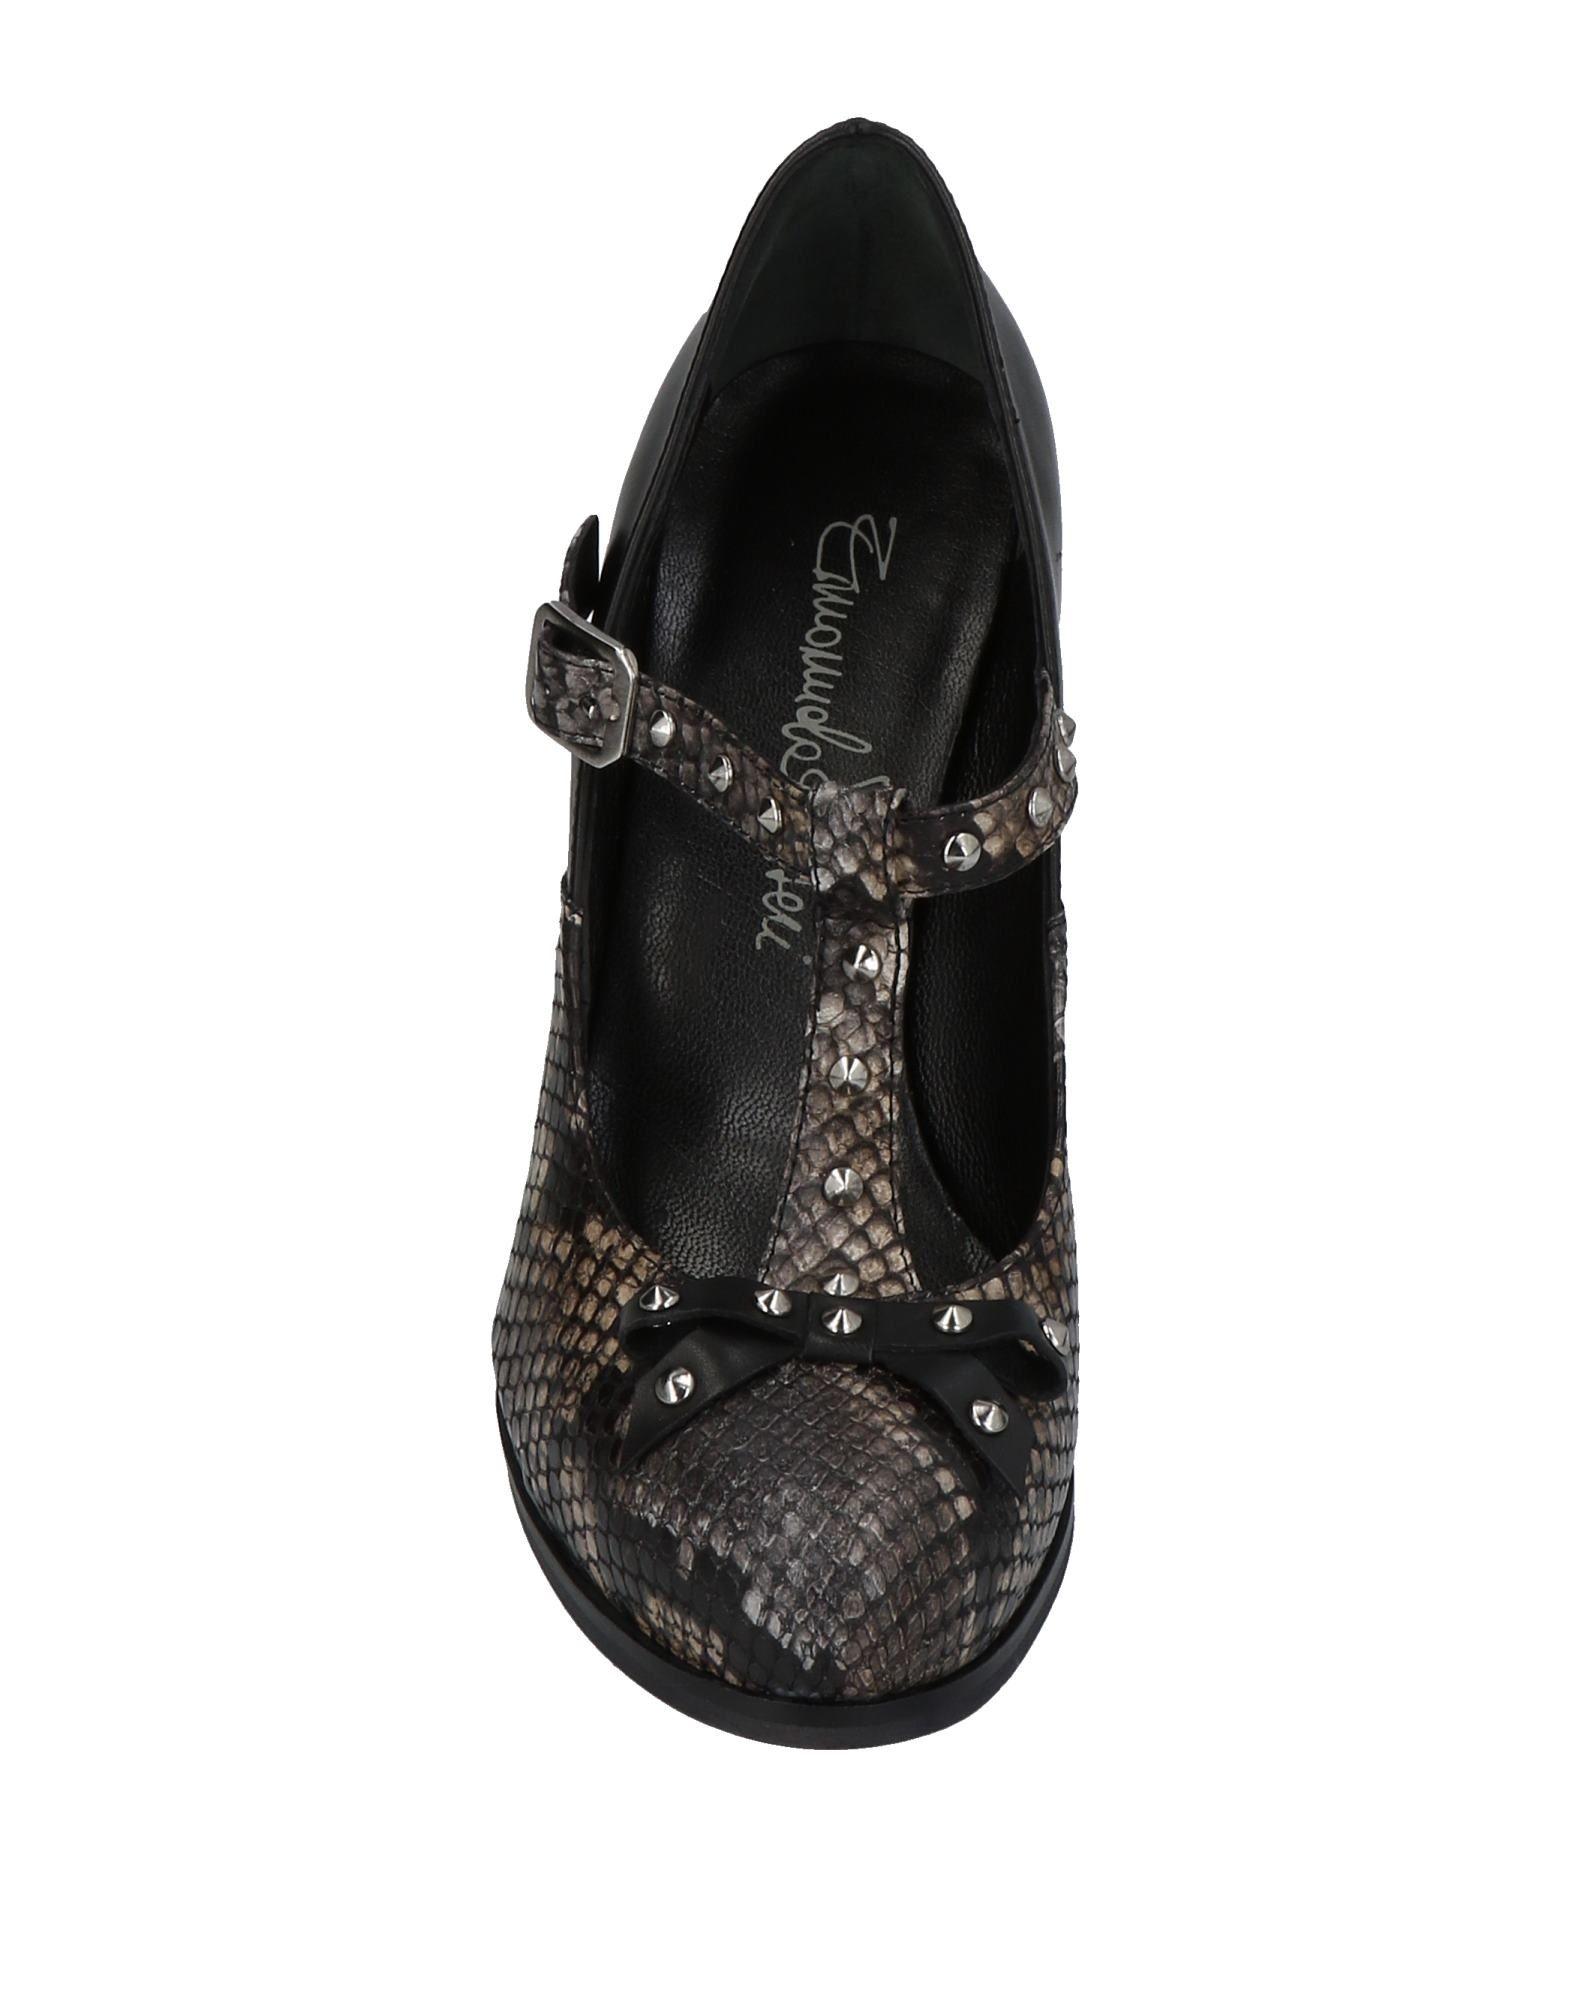 Emanuela Passeri Gute Pumps Damen  11444418DA Gute Passeri Qualität beliebte Schuhe d1ef9f